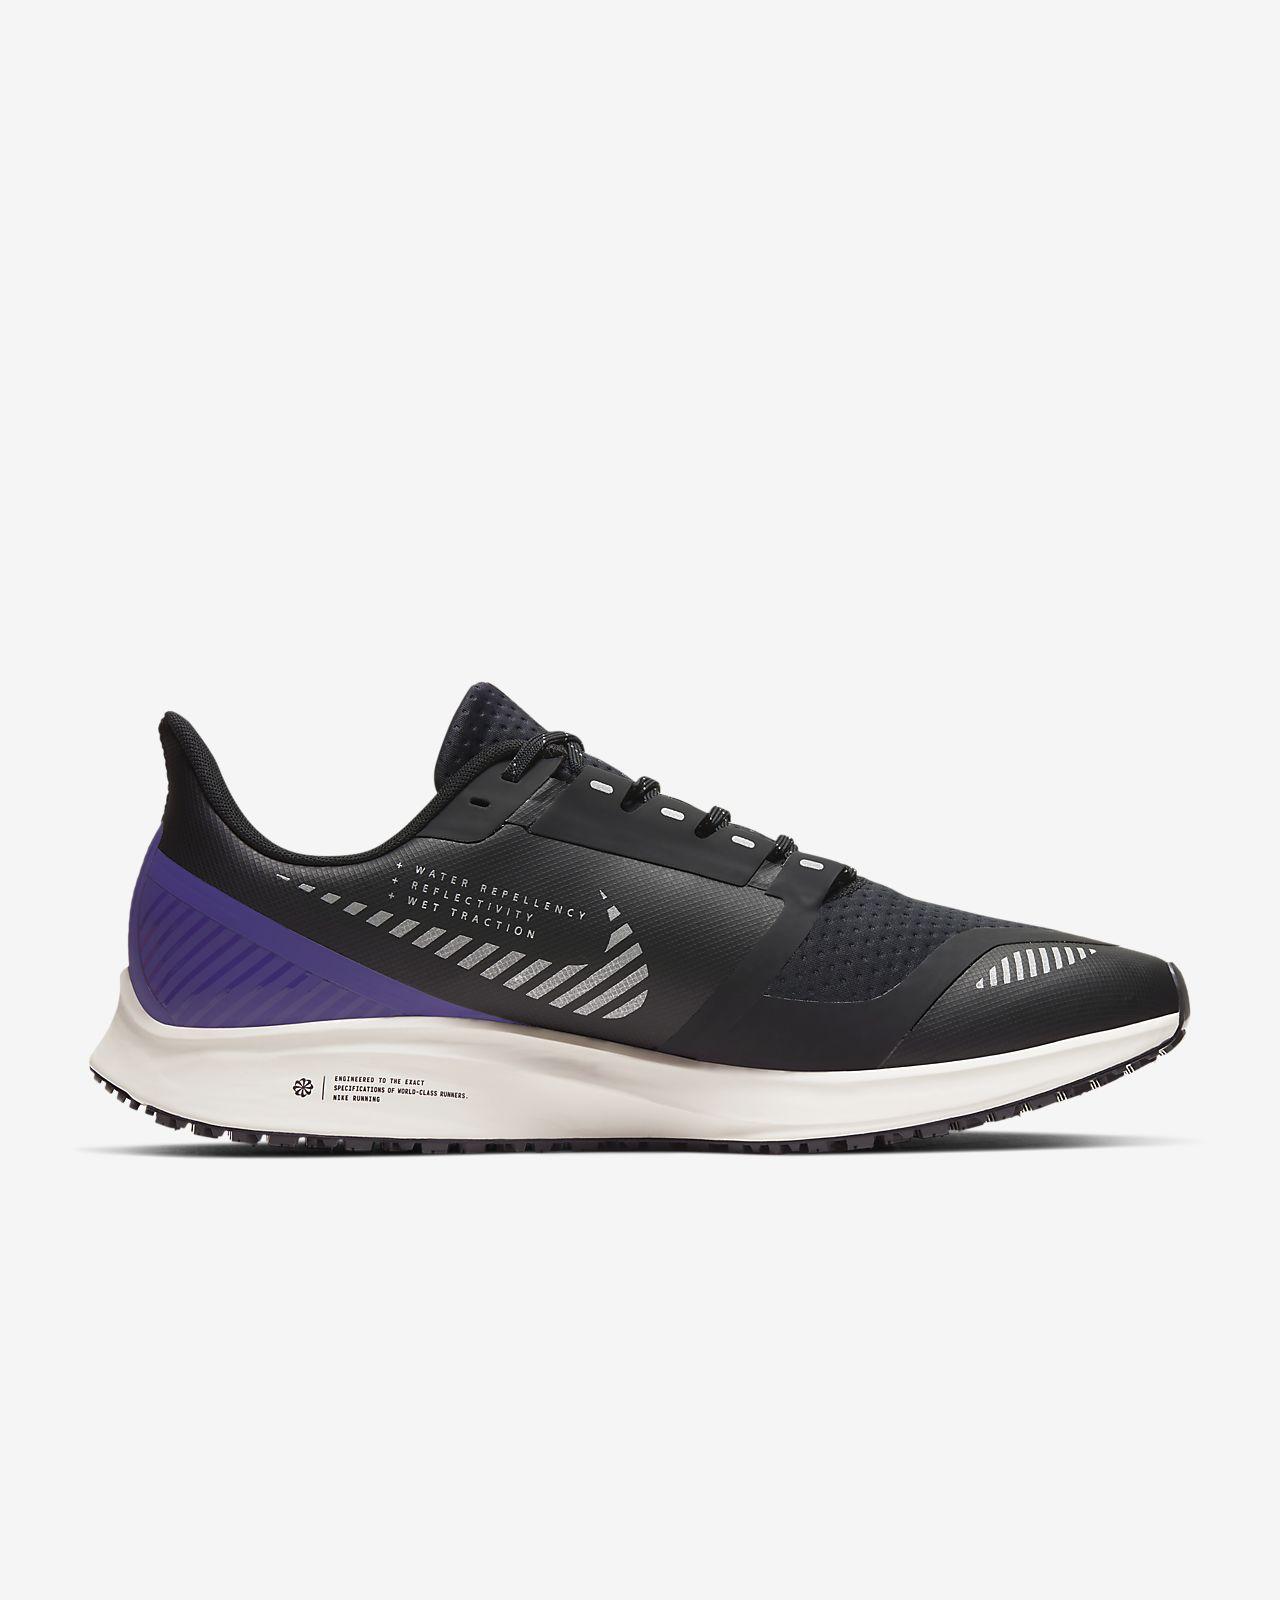 Sapatilhas de running Nike Air Zoom Pegasus 36 Shield para homem